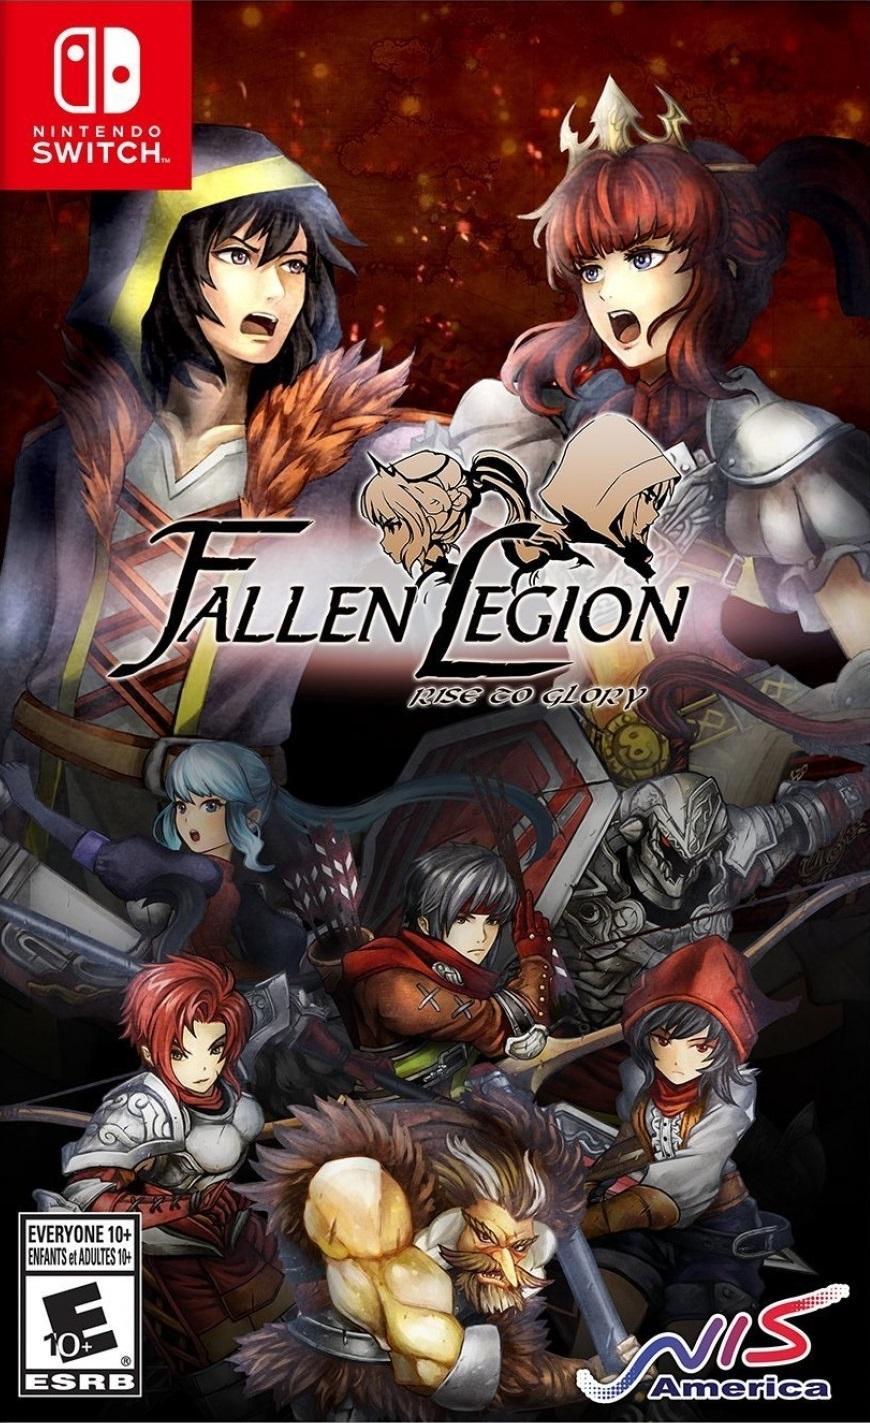 fallen-legion-rise-to-glory-549987.11.jpg